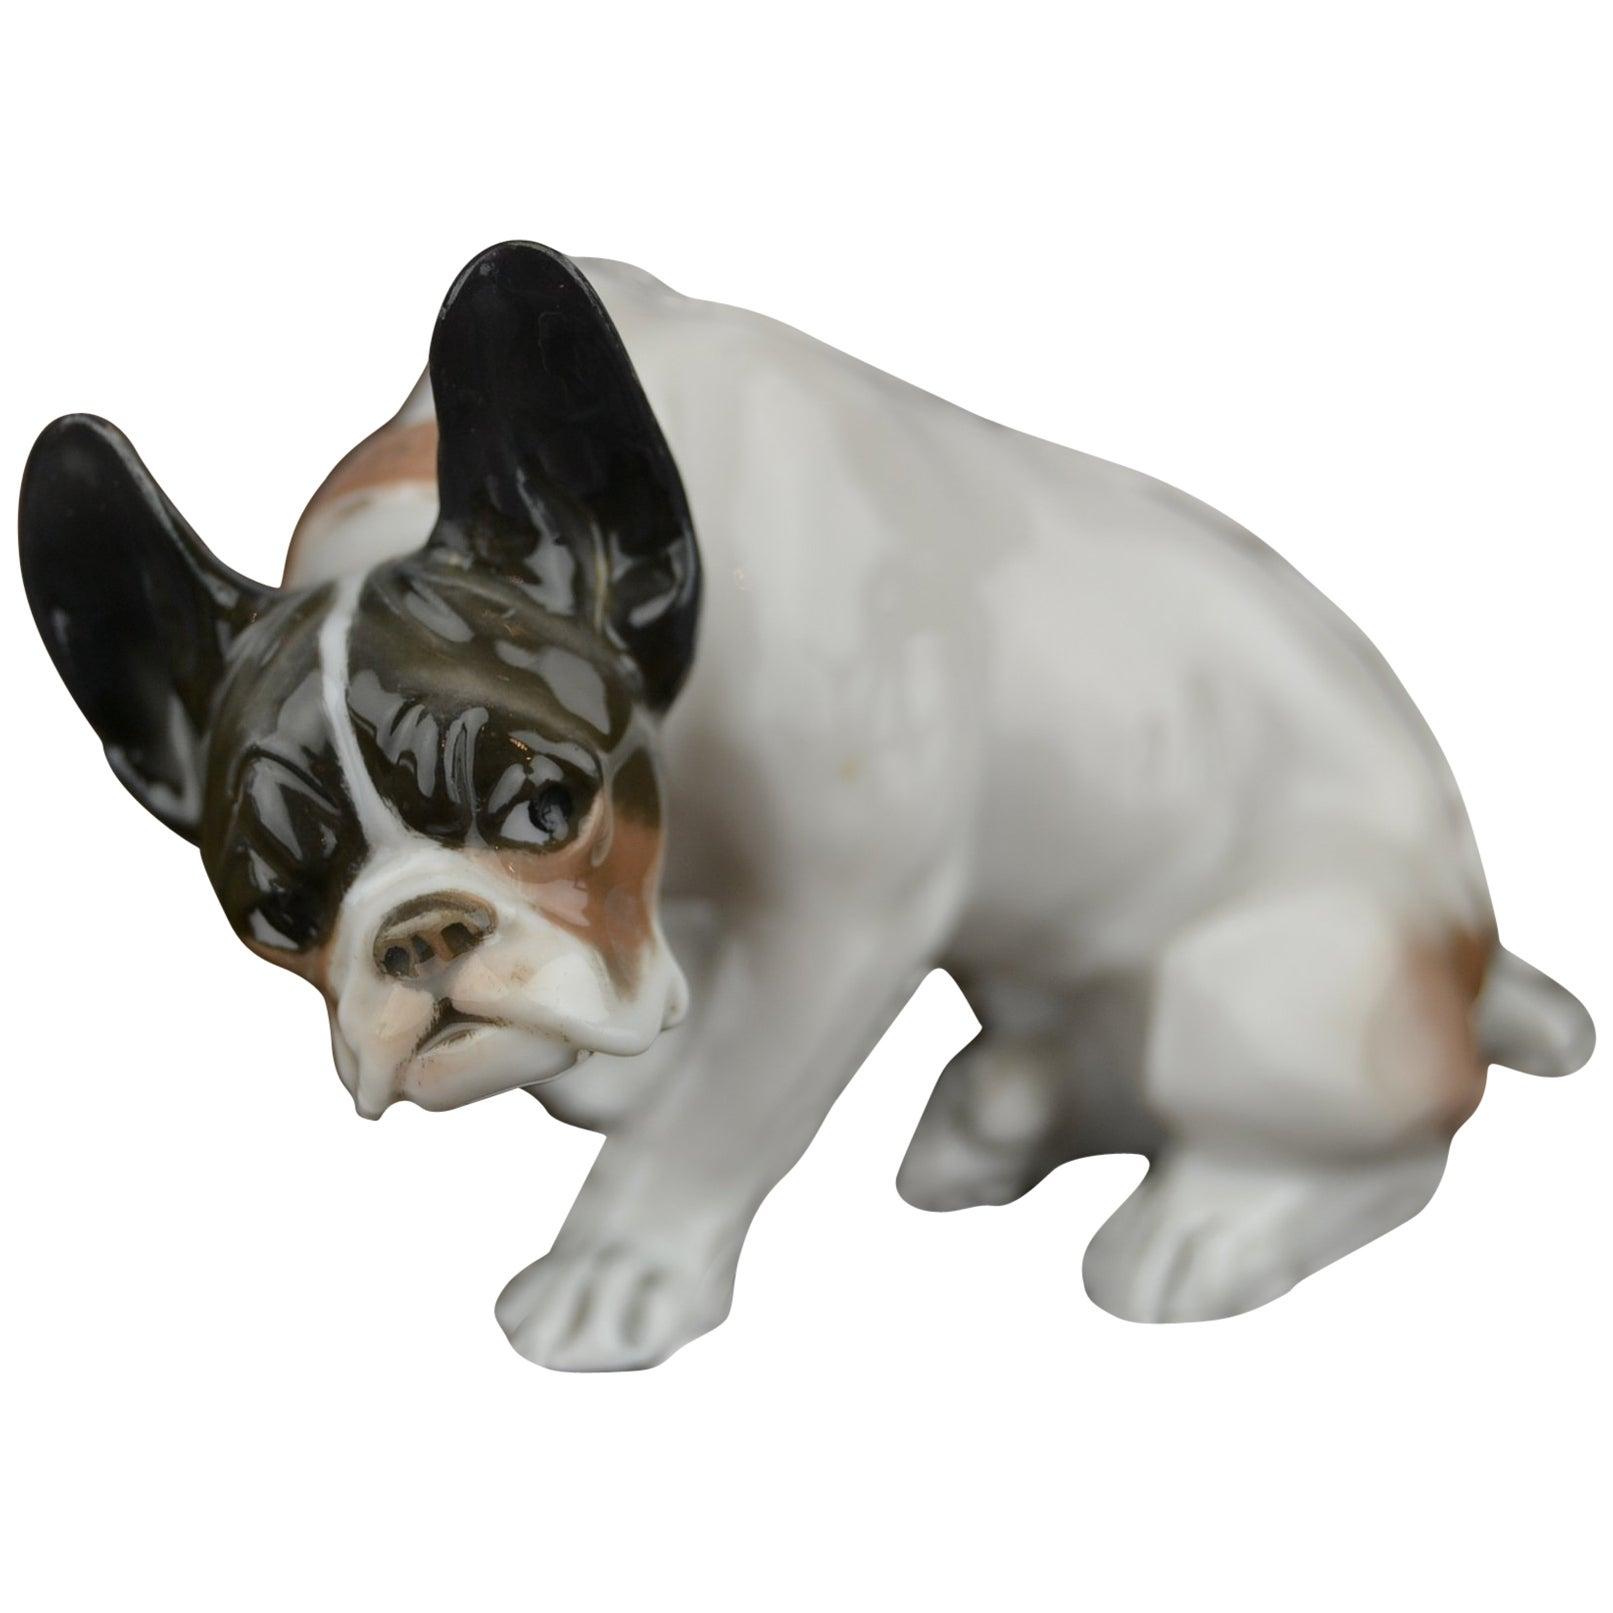 F.Diller signed Porcelain French Bulldog by Rosenthal Selb Bavaria, 1920s